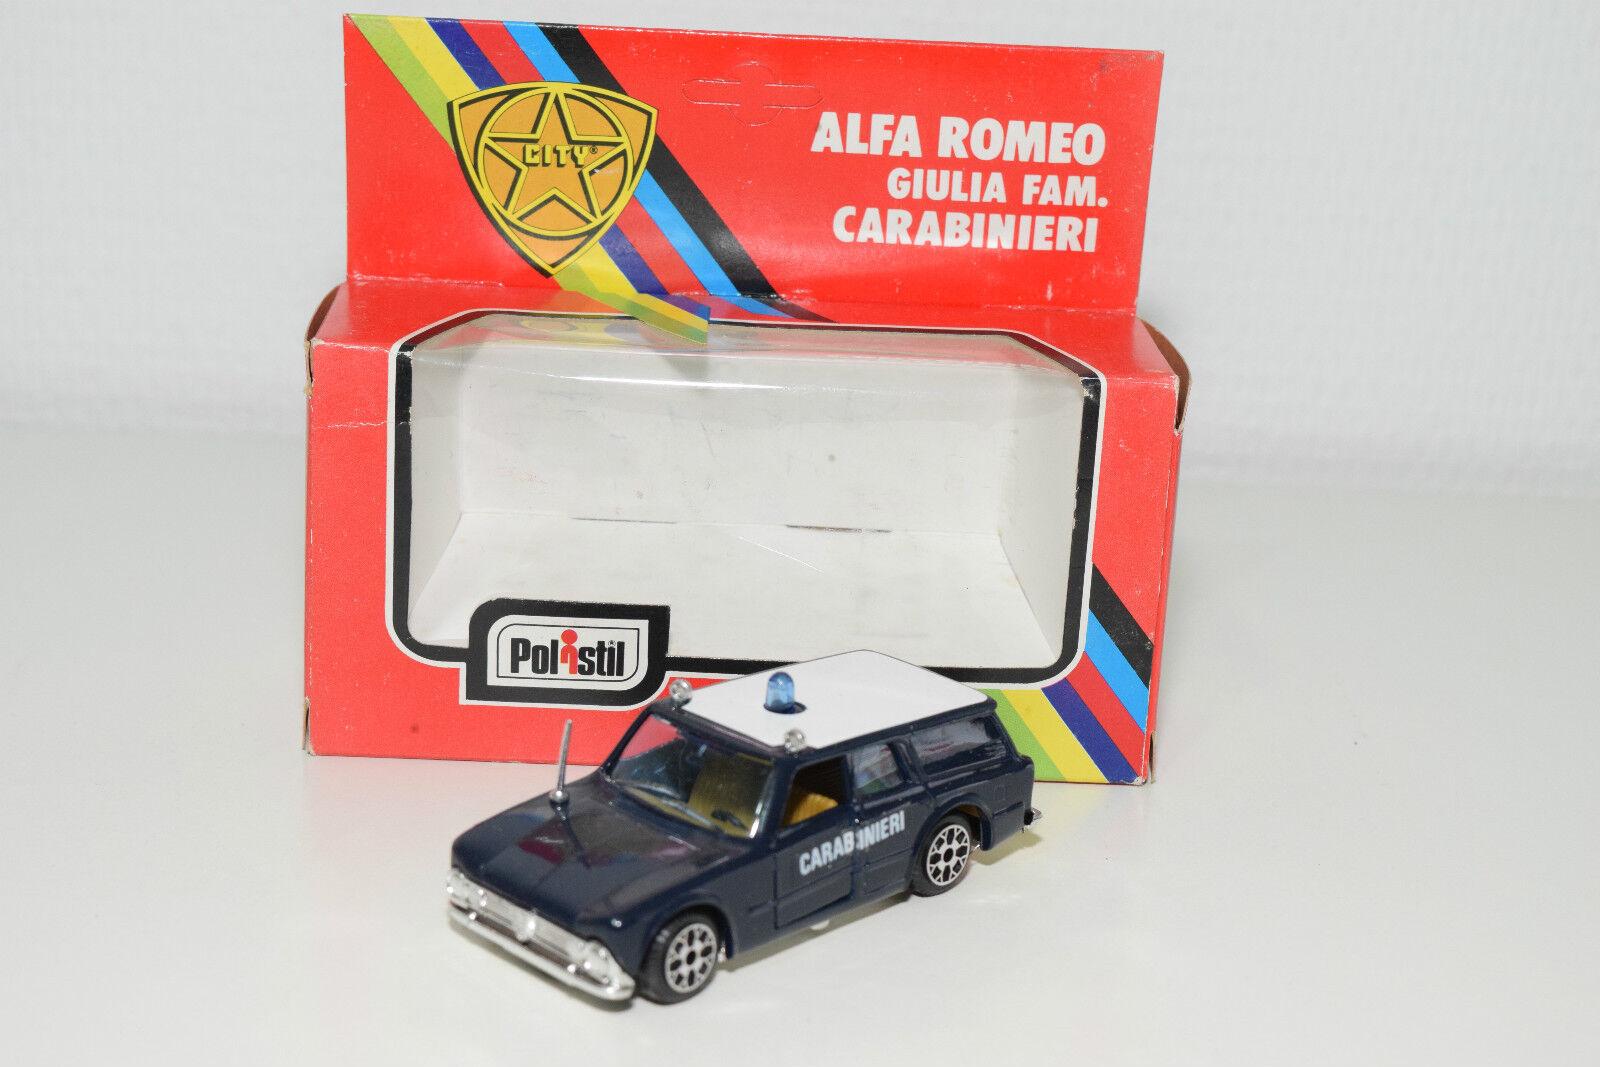 POLISTIL CE15 CE 15 CE-15 ALFA ROMEO  GIULIA FAM. voitureABINIERI MINT BOXED RARE  magasiner en ligne aujourd'hui